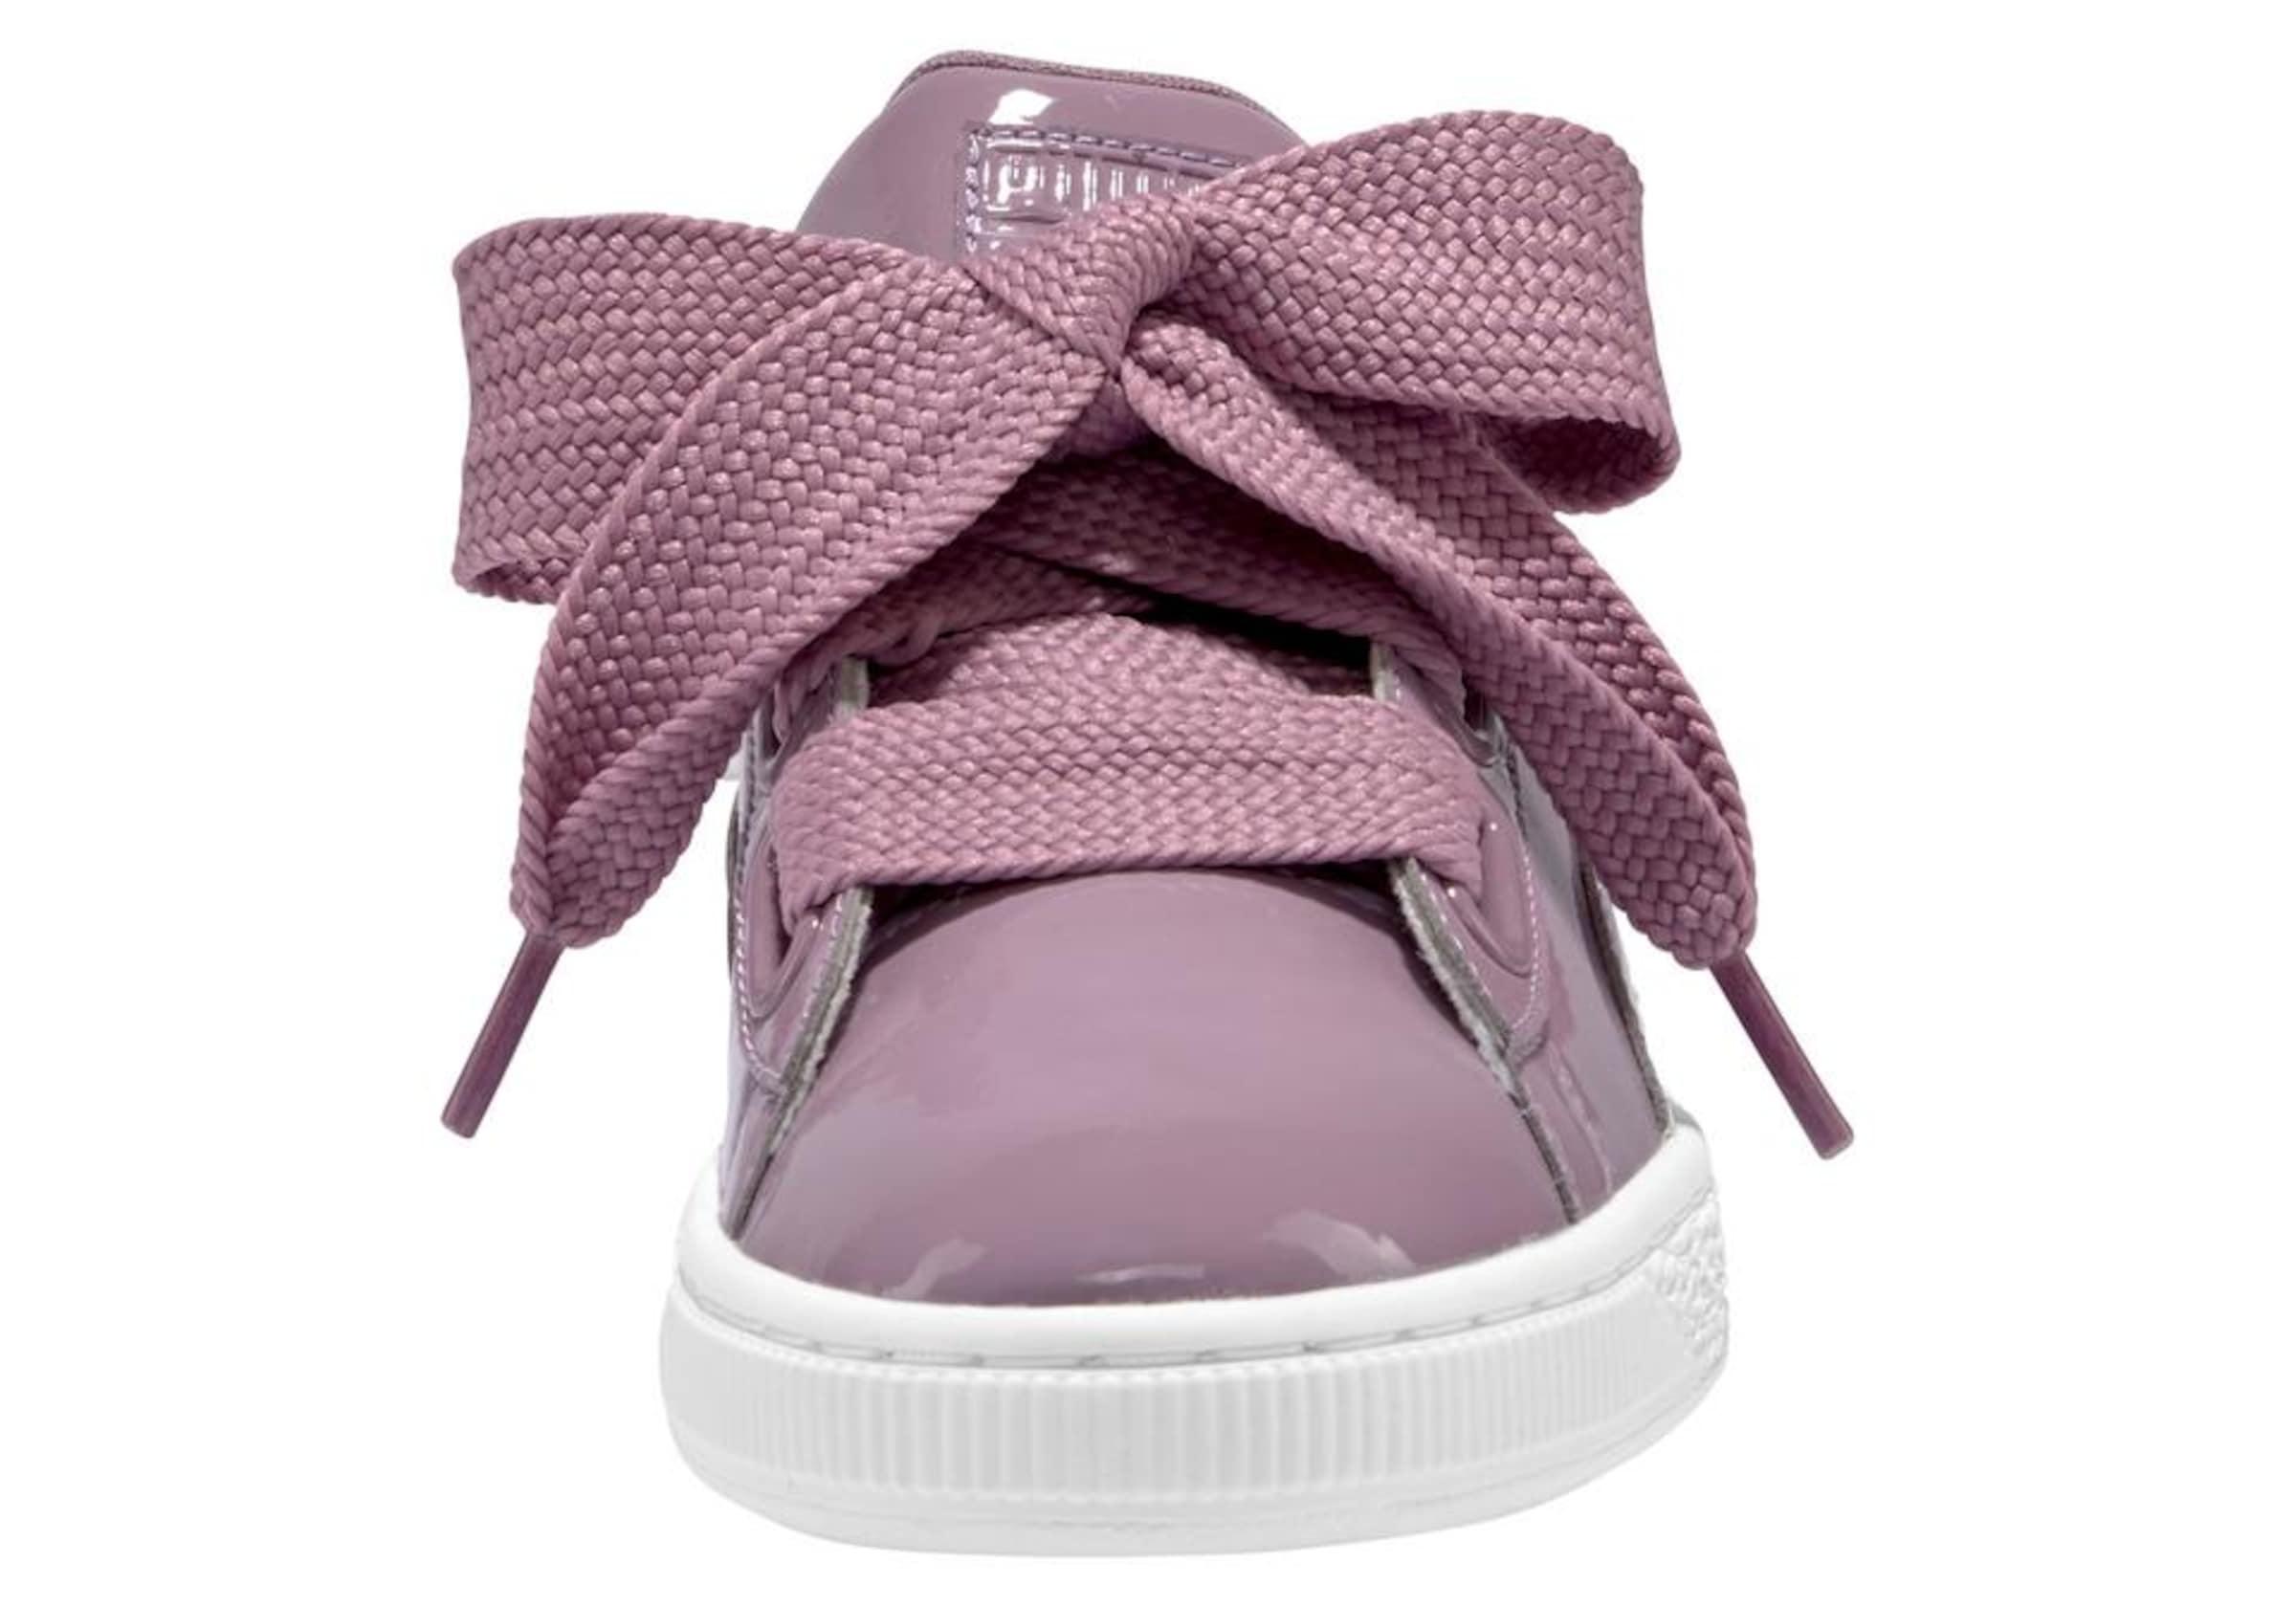 Heart Sneaker In 'basket Puma Patent' Qrcdtsxohb Lila u35KJlTF1c